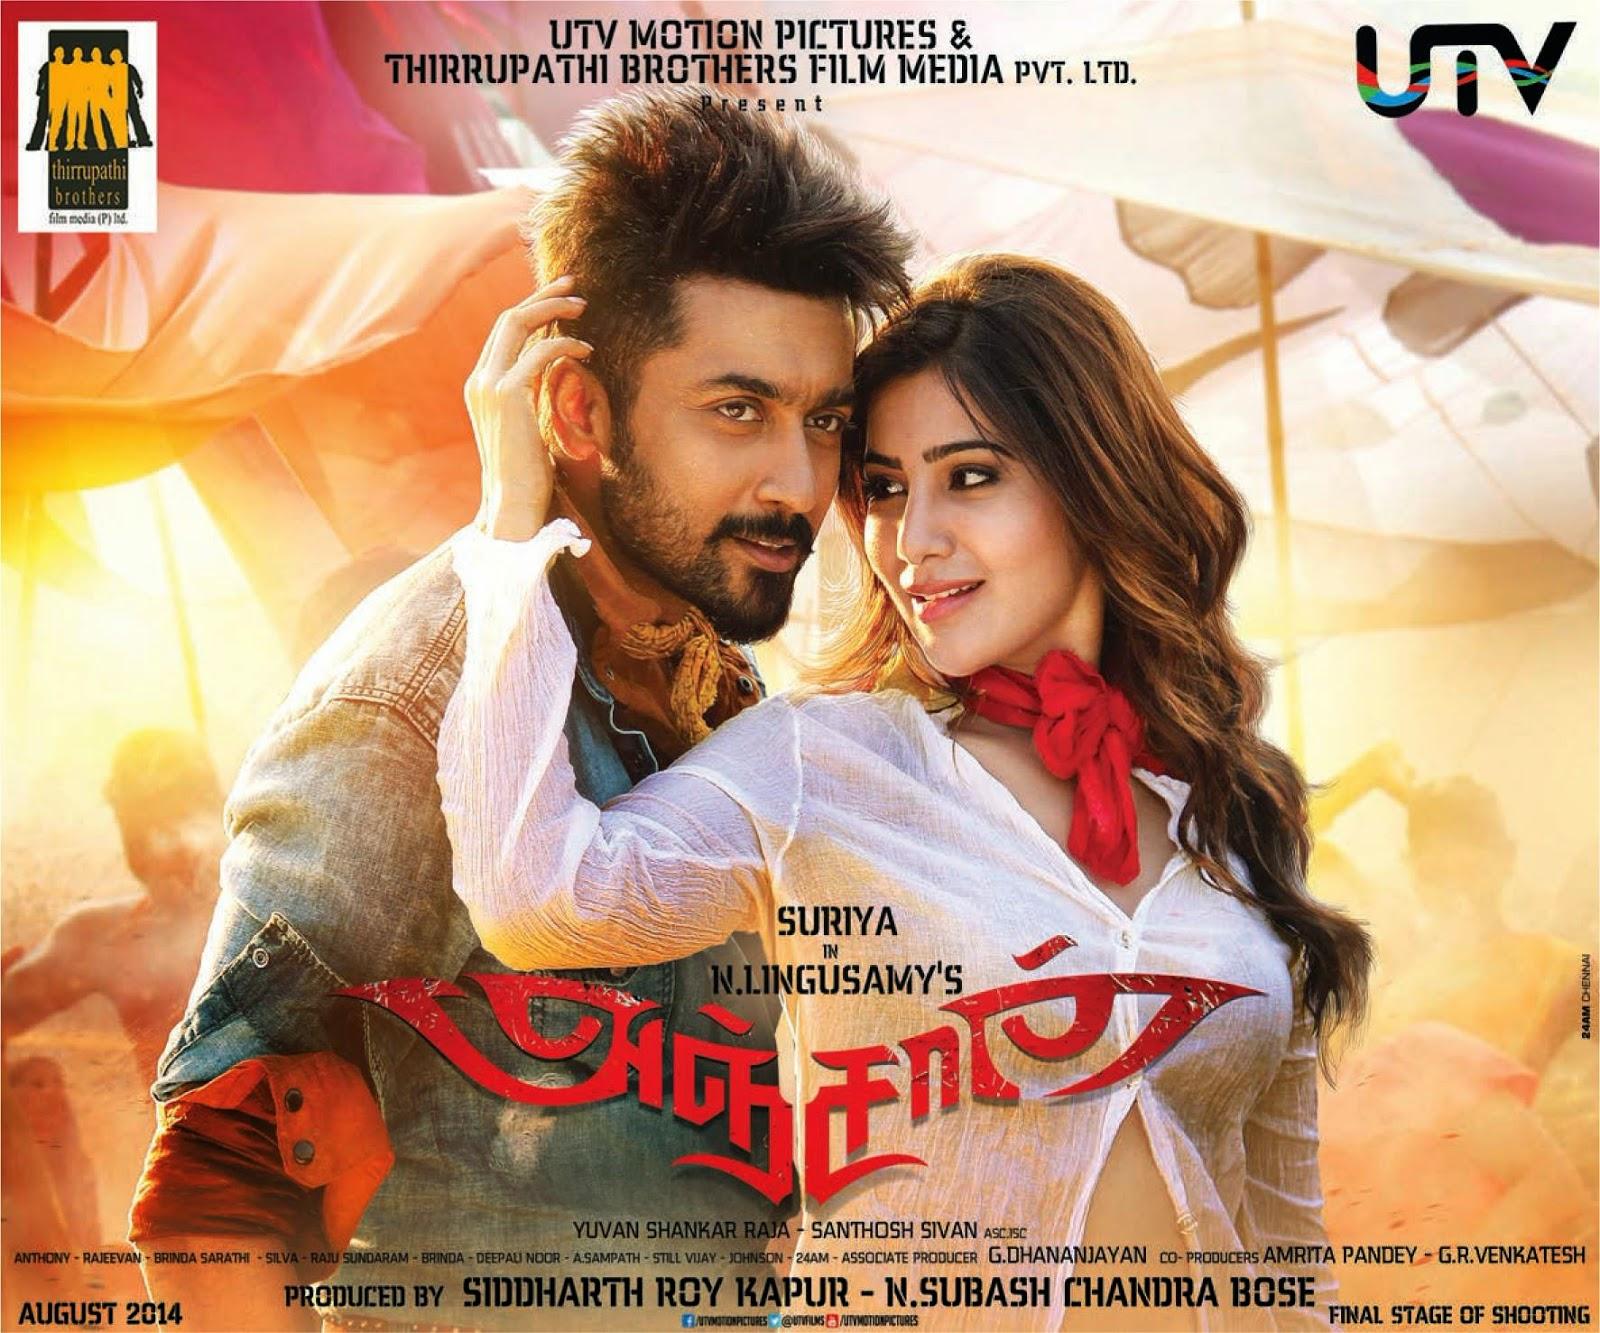 stylish' surya rocks in 'anjaan' first looks! | actor surya blog